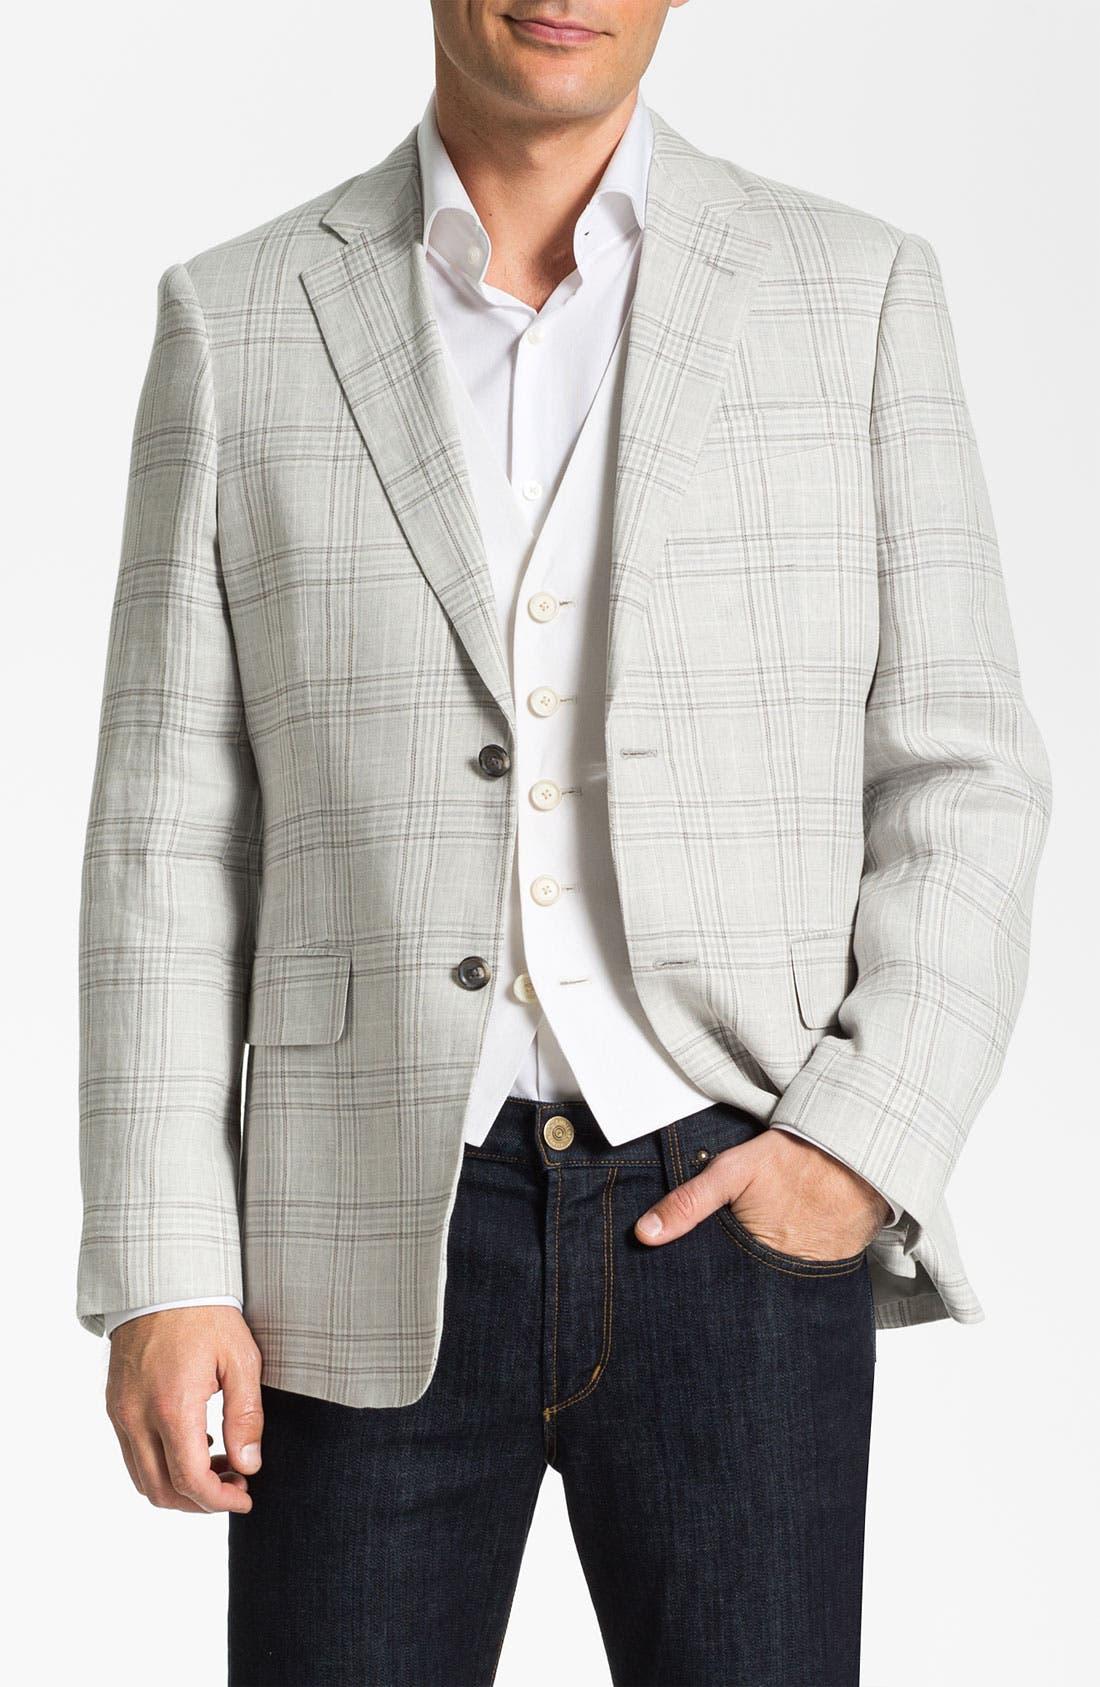 Main Image - John W. Nordstrom® Linen Plaid Sportcoat